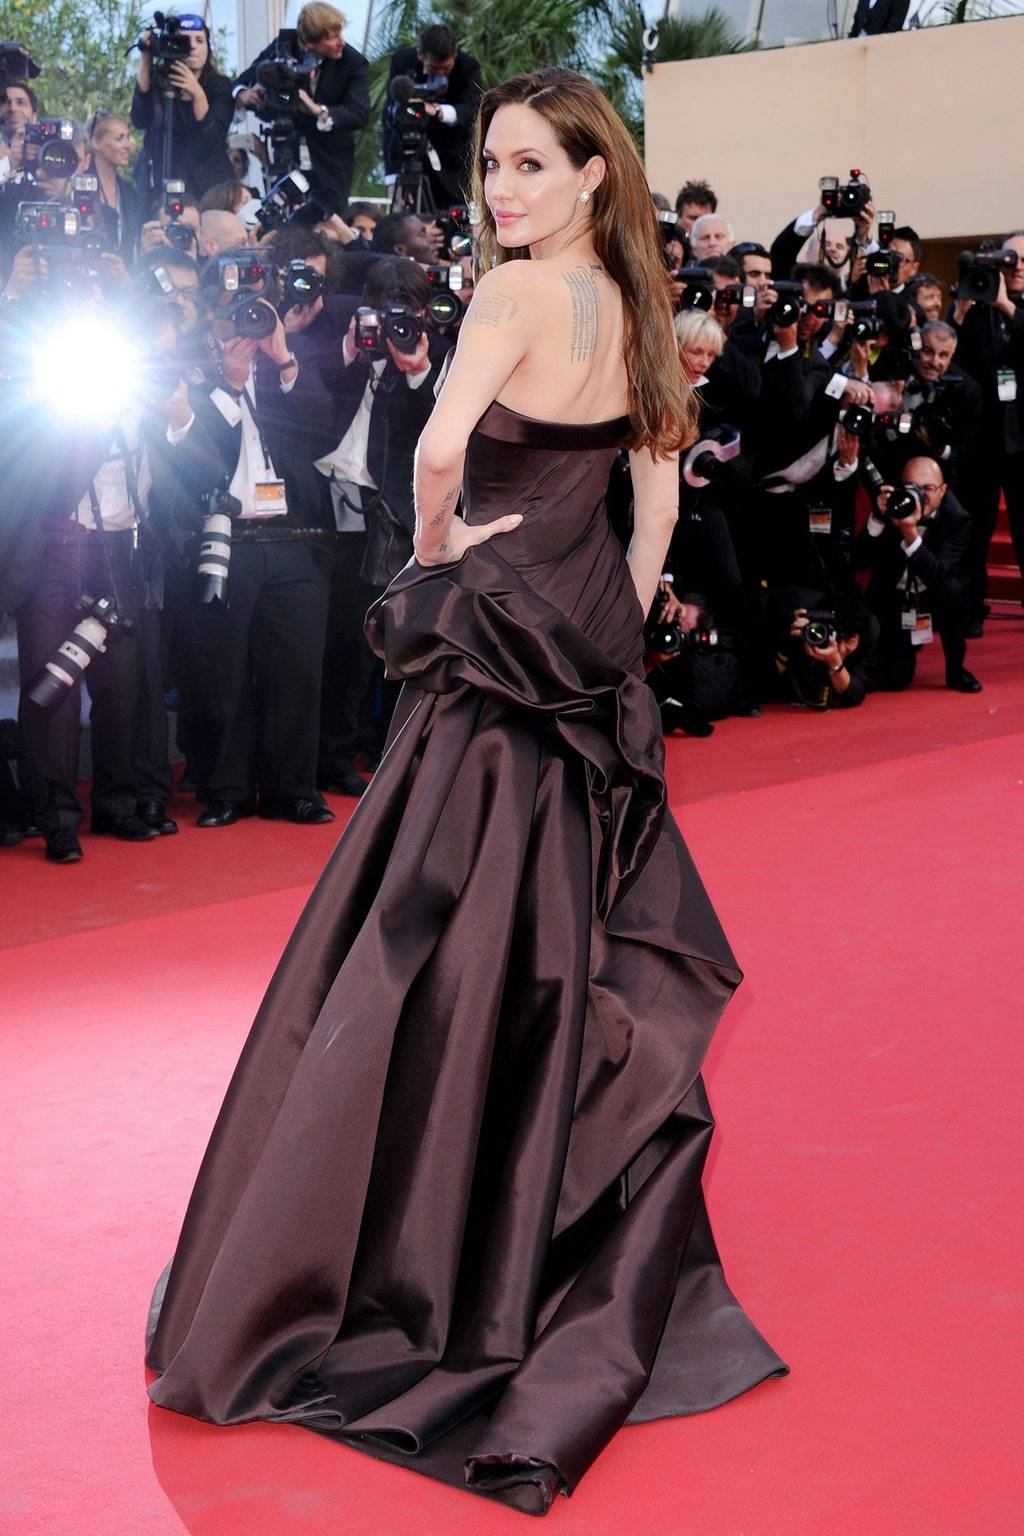 Phong cách thời trang thanh lịch Angelina Jolie